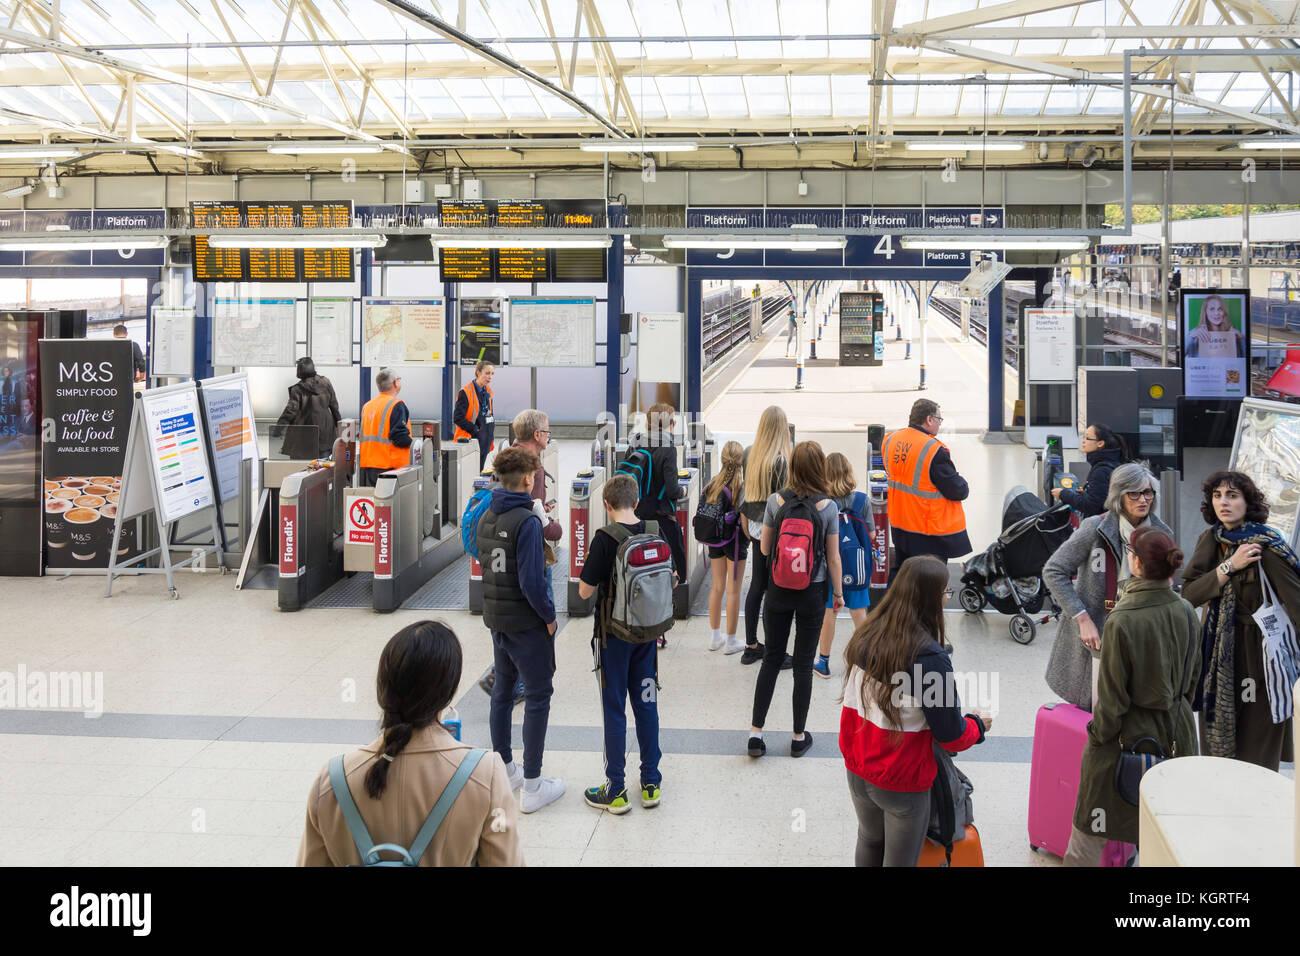 Entrance gates to Richmond Underground Station, Richmond, London Borough of Richmond upon Thames, Greater London, - Stock Image